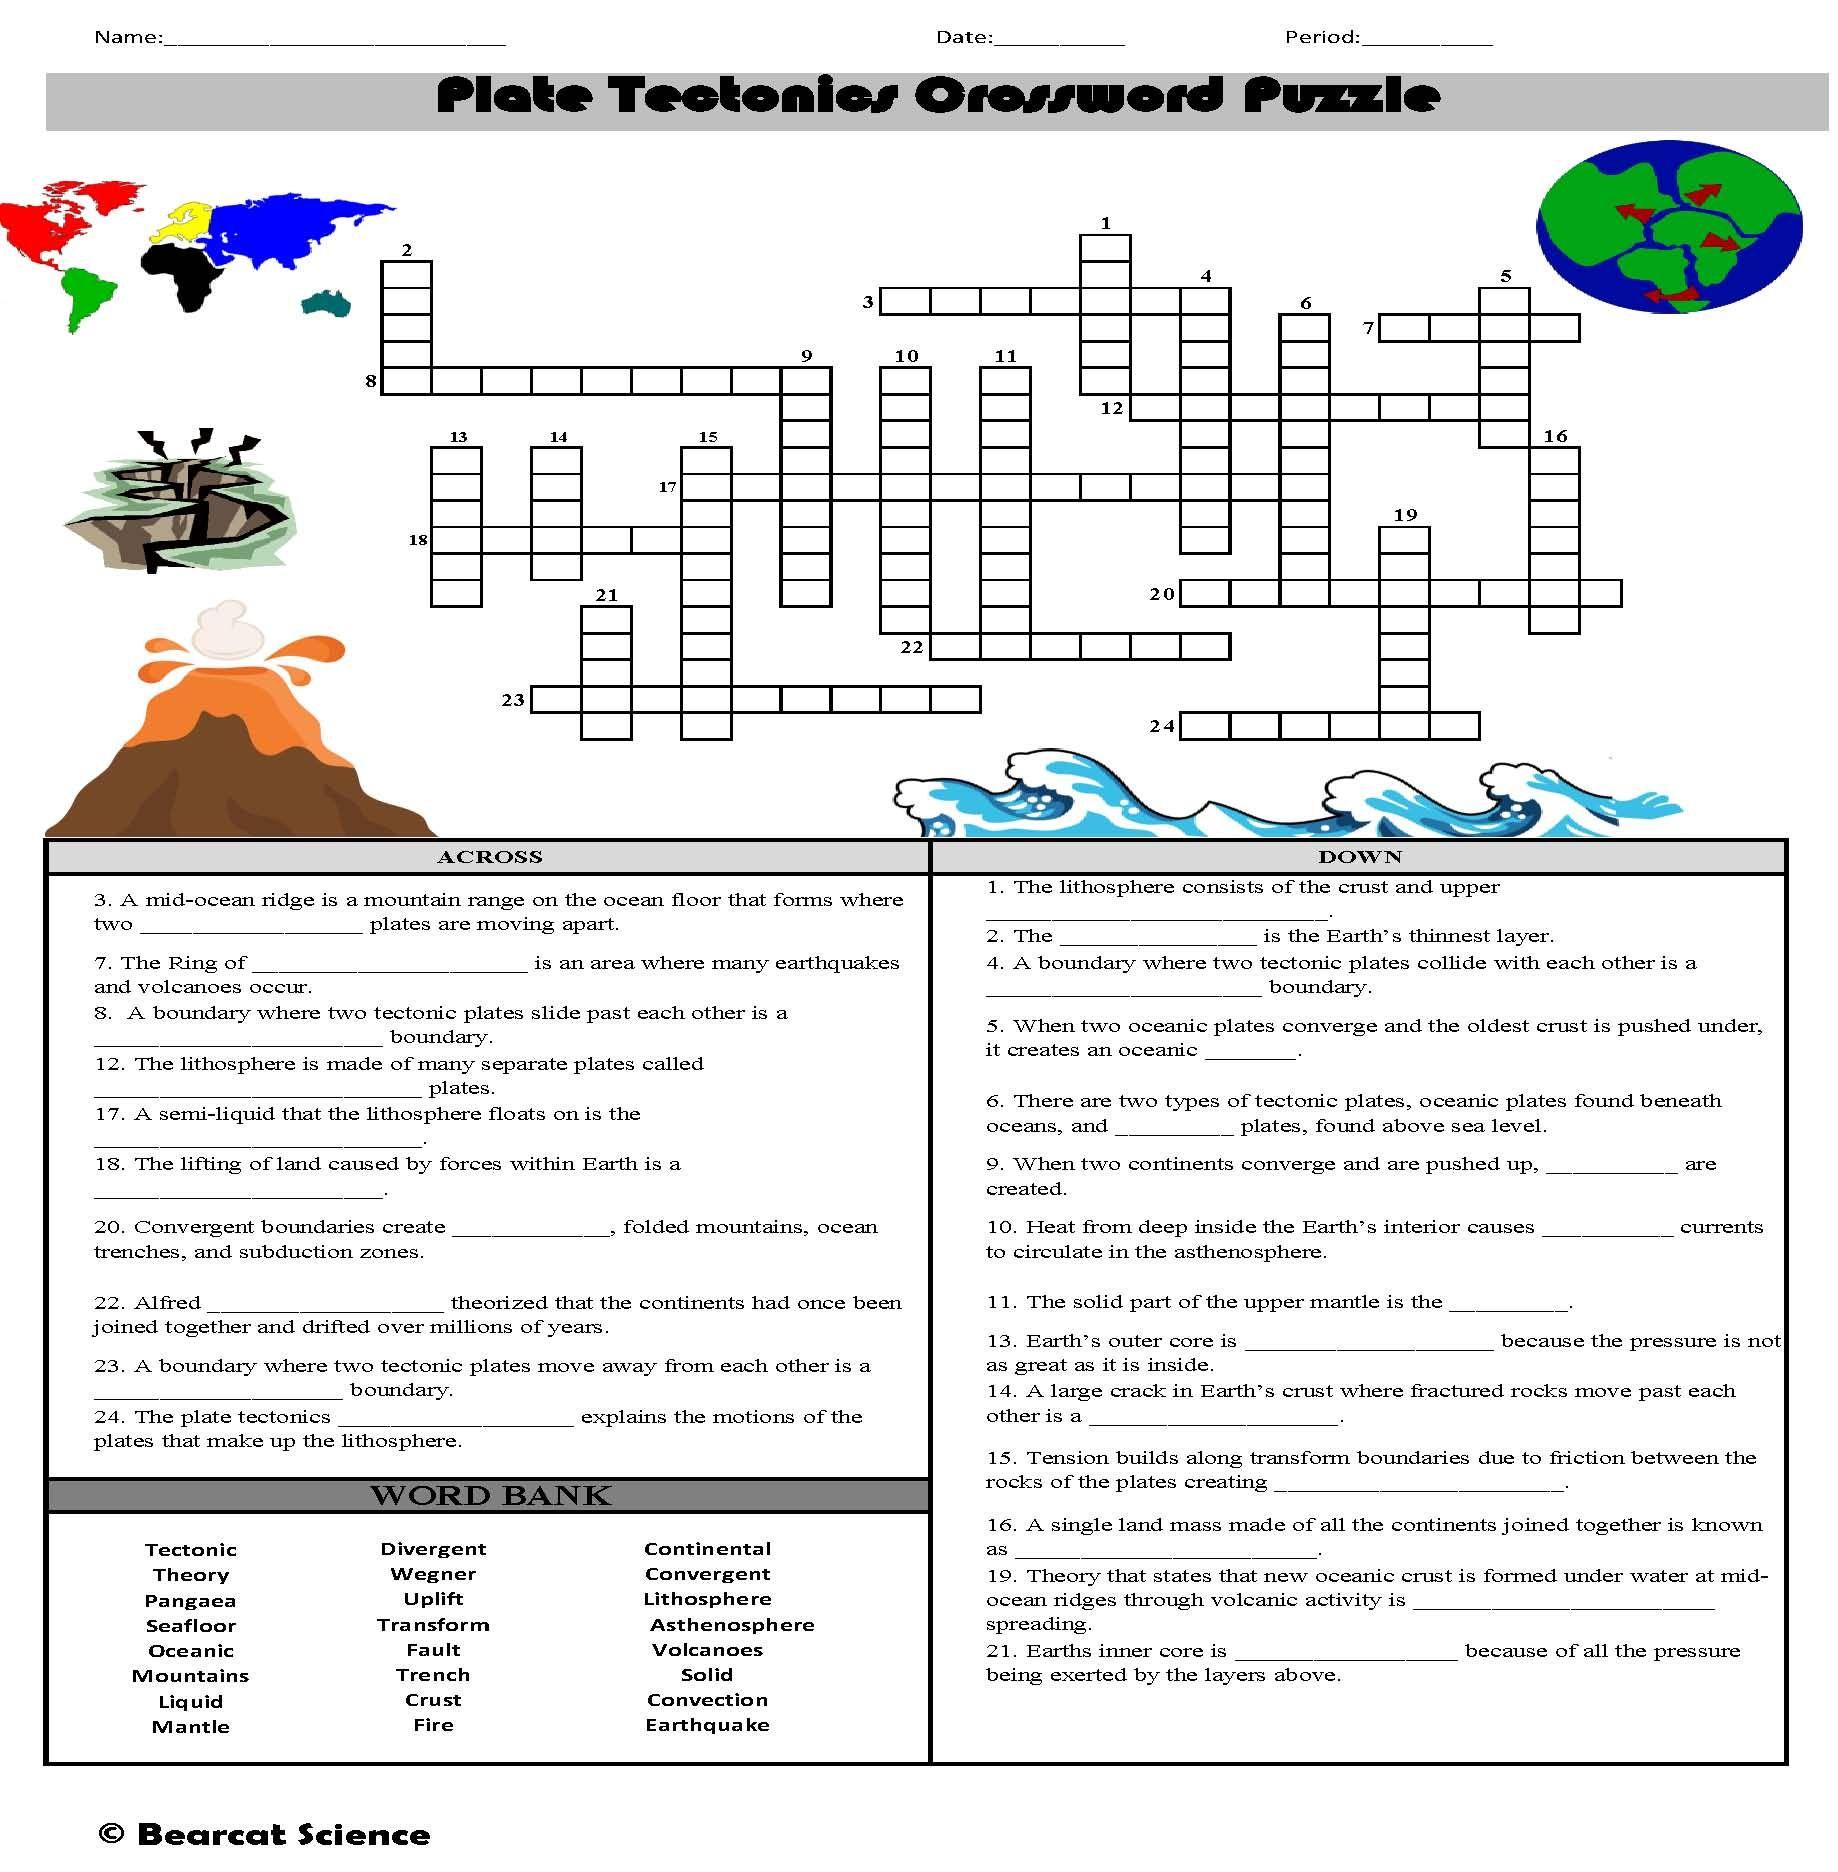 Plate Tectonics Crossword Plate Boundaries Boundaries Worksheet Plate Tectonics